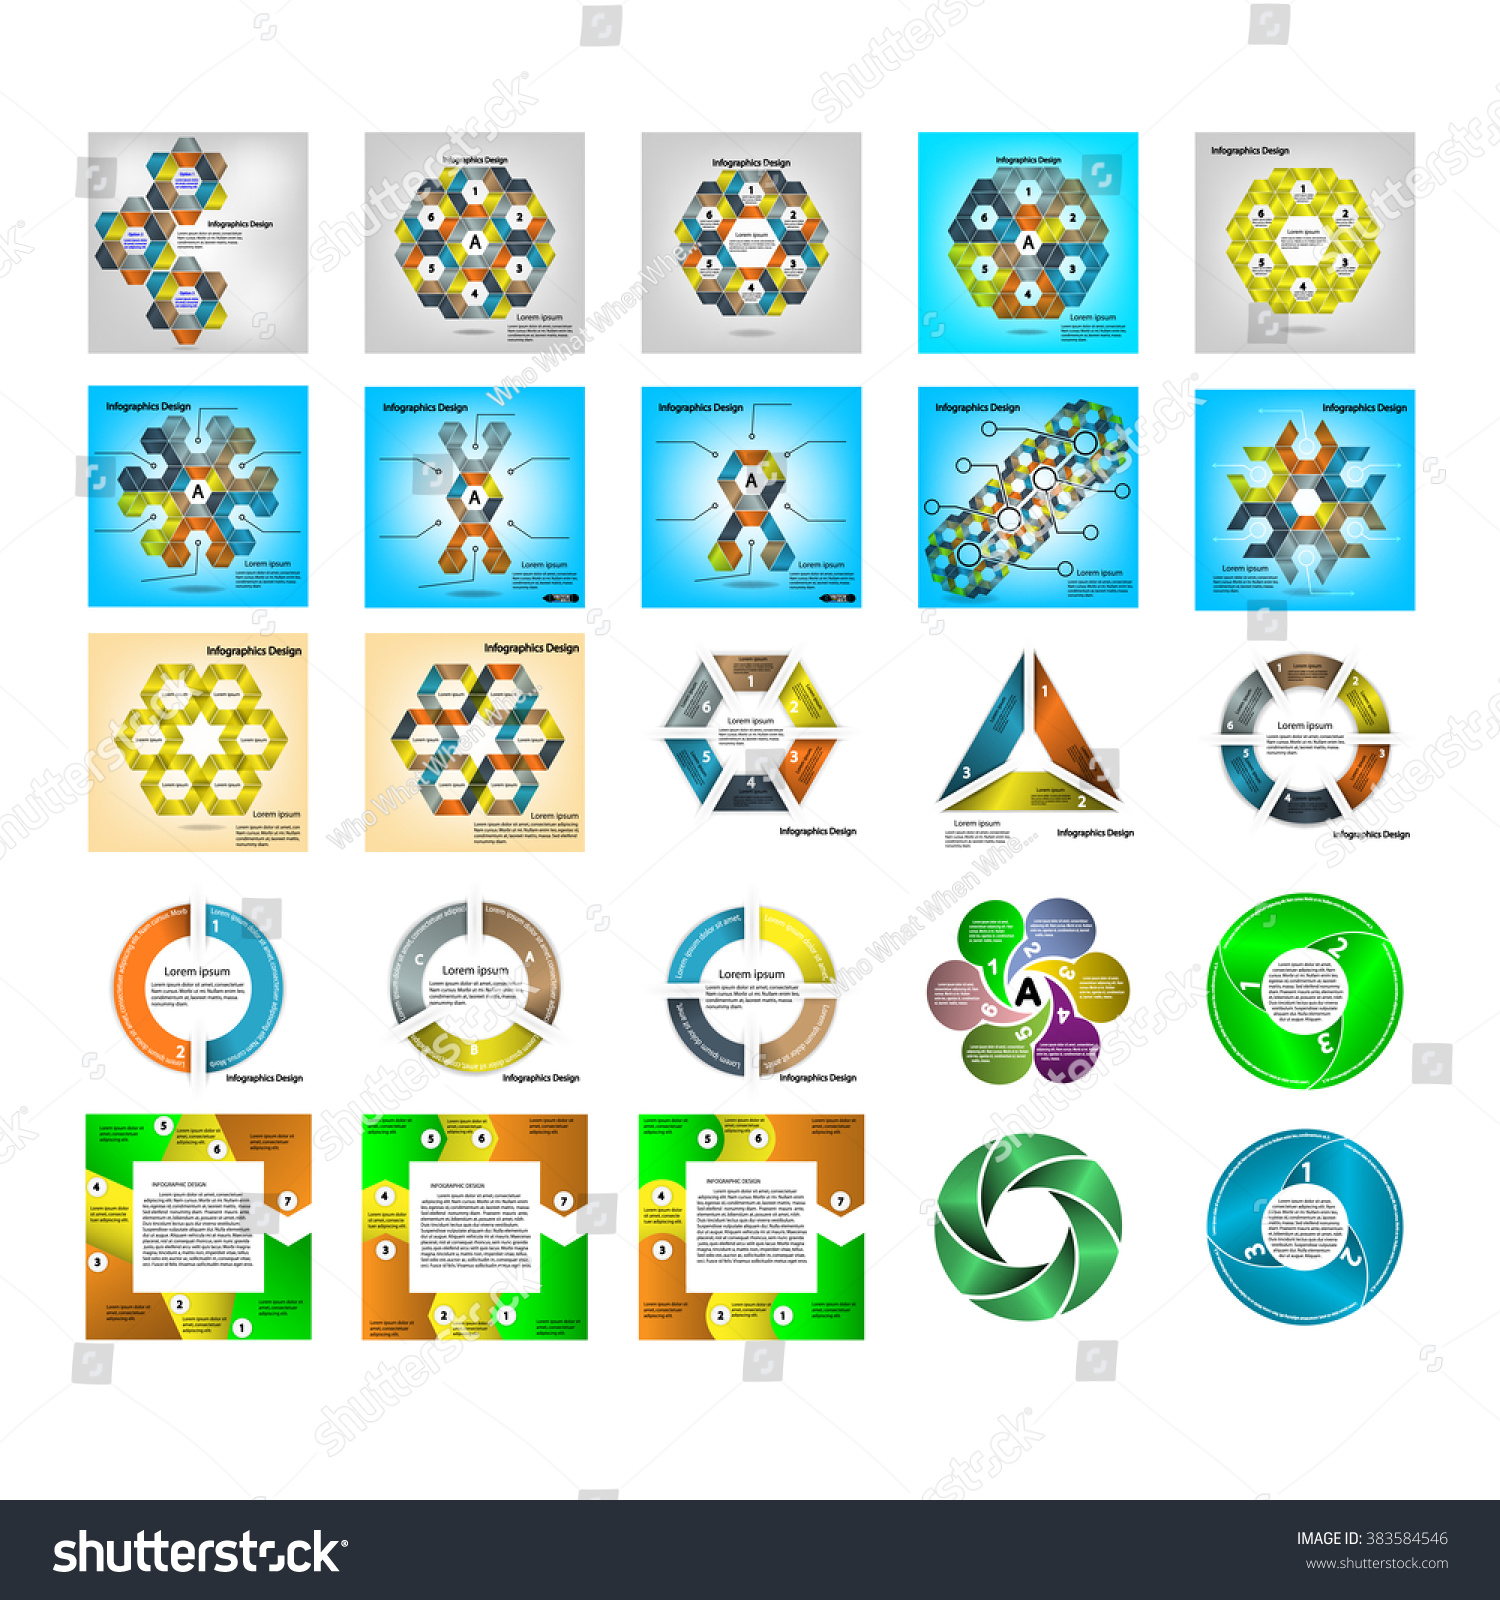 Set of infographic business presentation templatepowerpoint set of infographic business presentation templatepowerpoint template design backgroundsfographic element toneelgroepblik Images